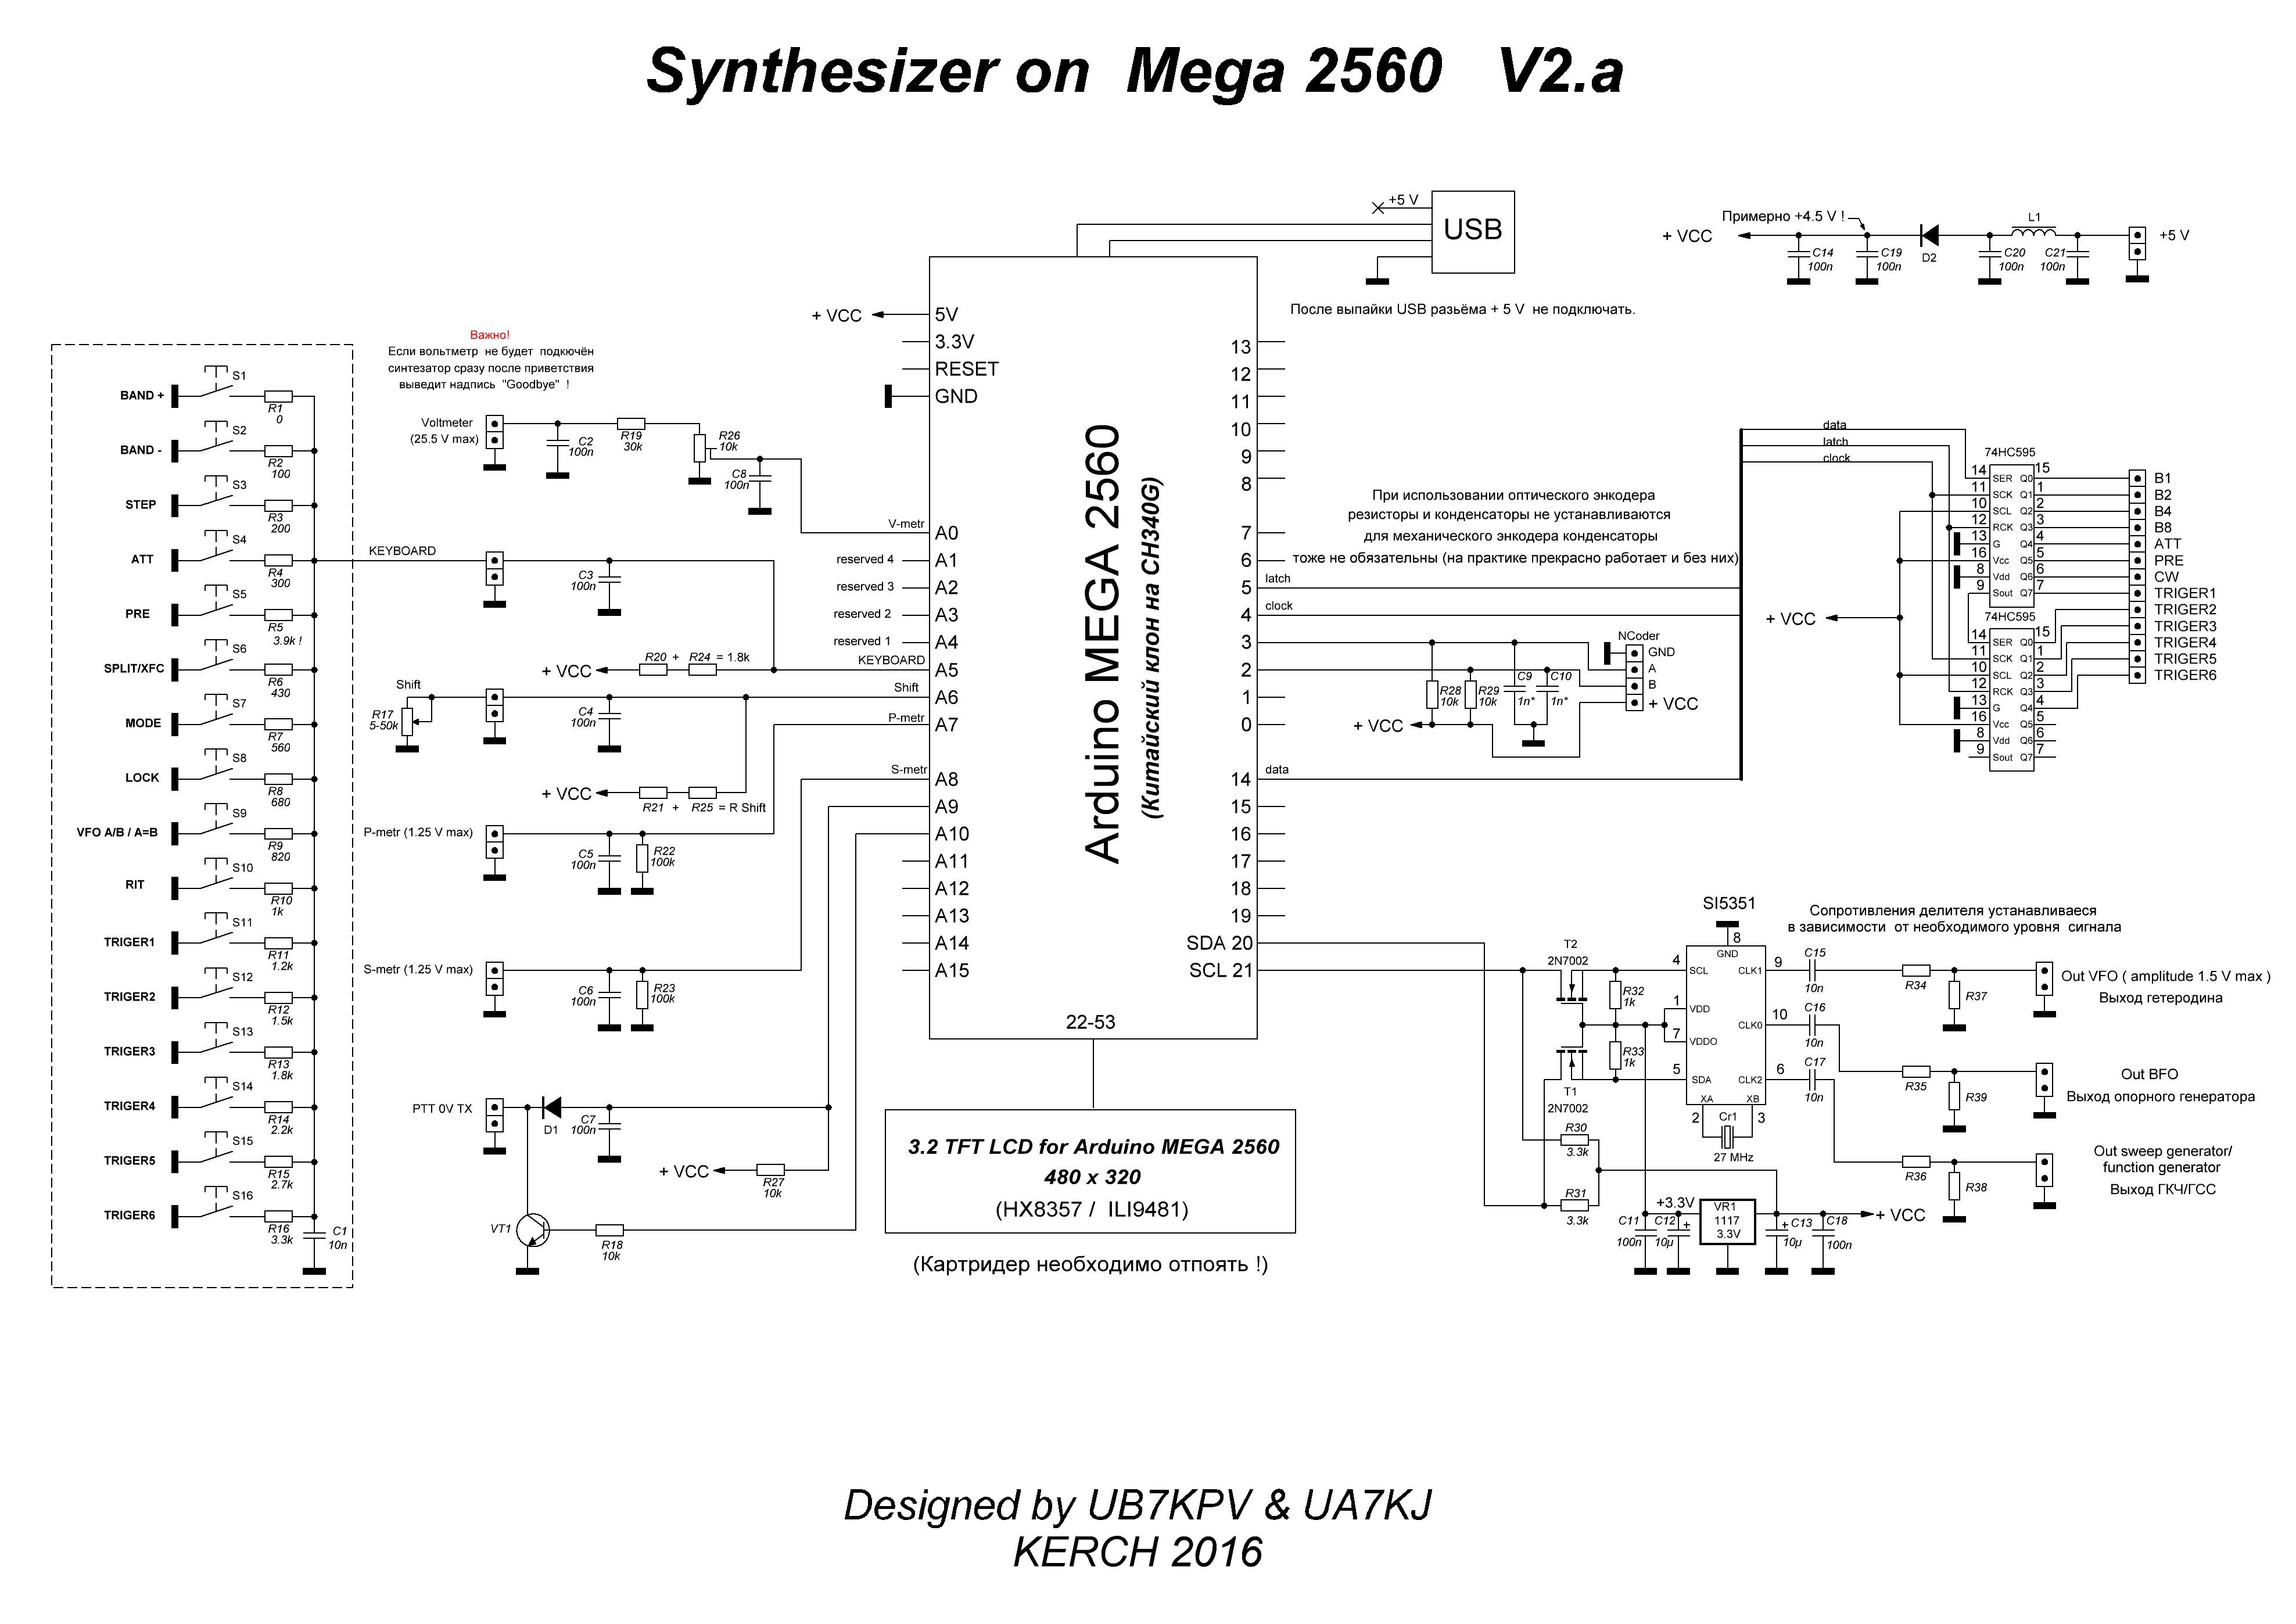 Synthesizer on Mega 2560 + 3 2 TFT LCD + Si5351 V2 0